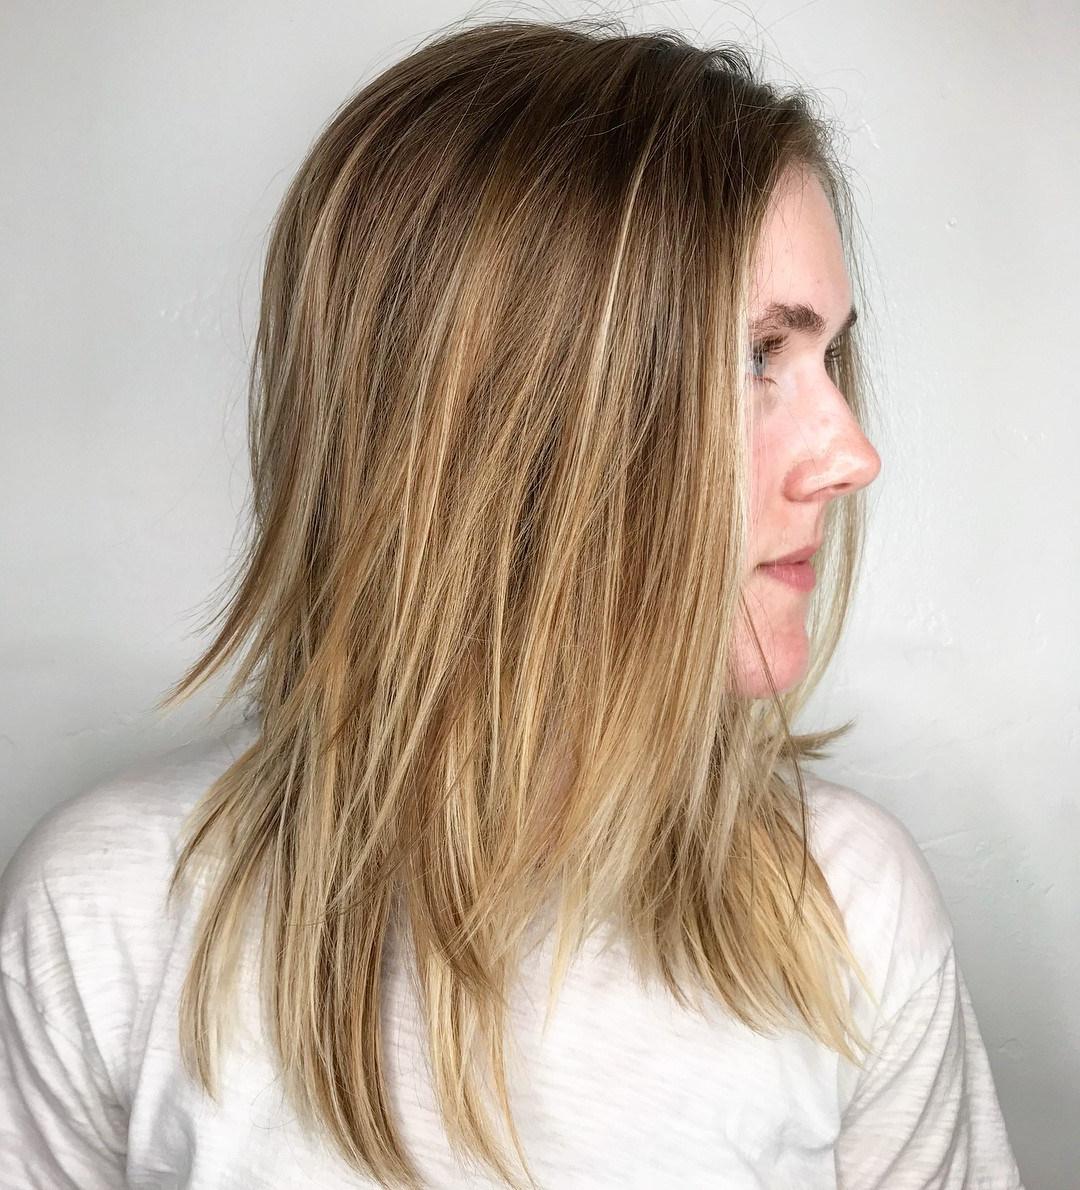 22 Modern Shag Haircut For Utter Stylish Look – Haircuts Regarding 2017 Sharp Shag Haircuts With Razored Layers (View 6 of 20)